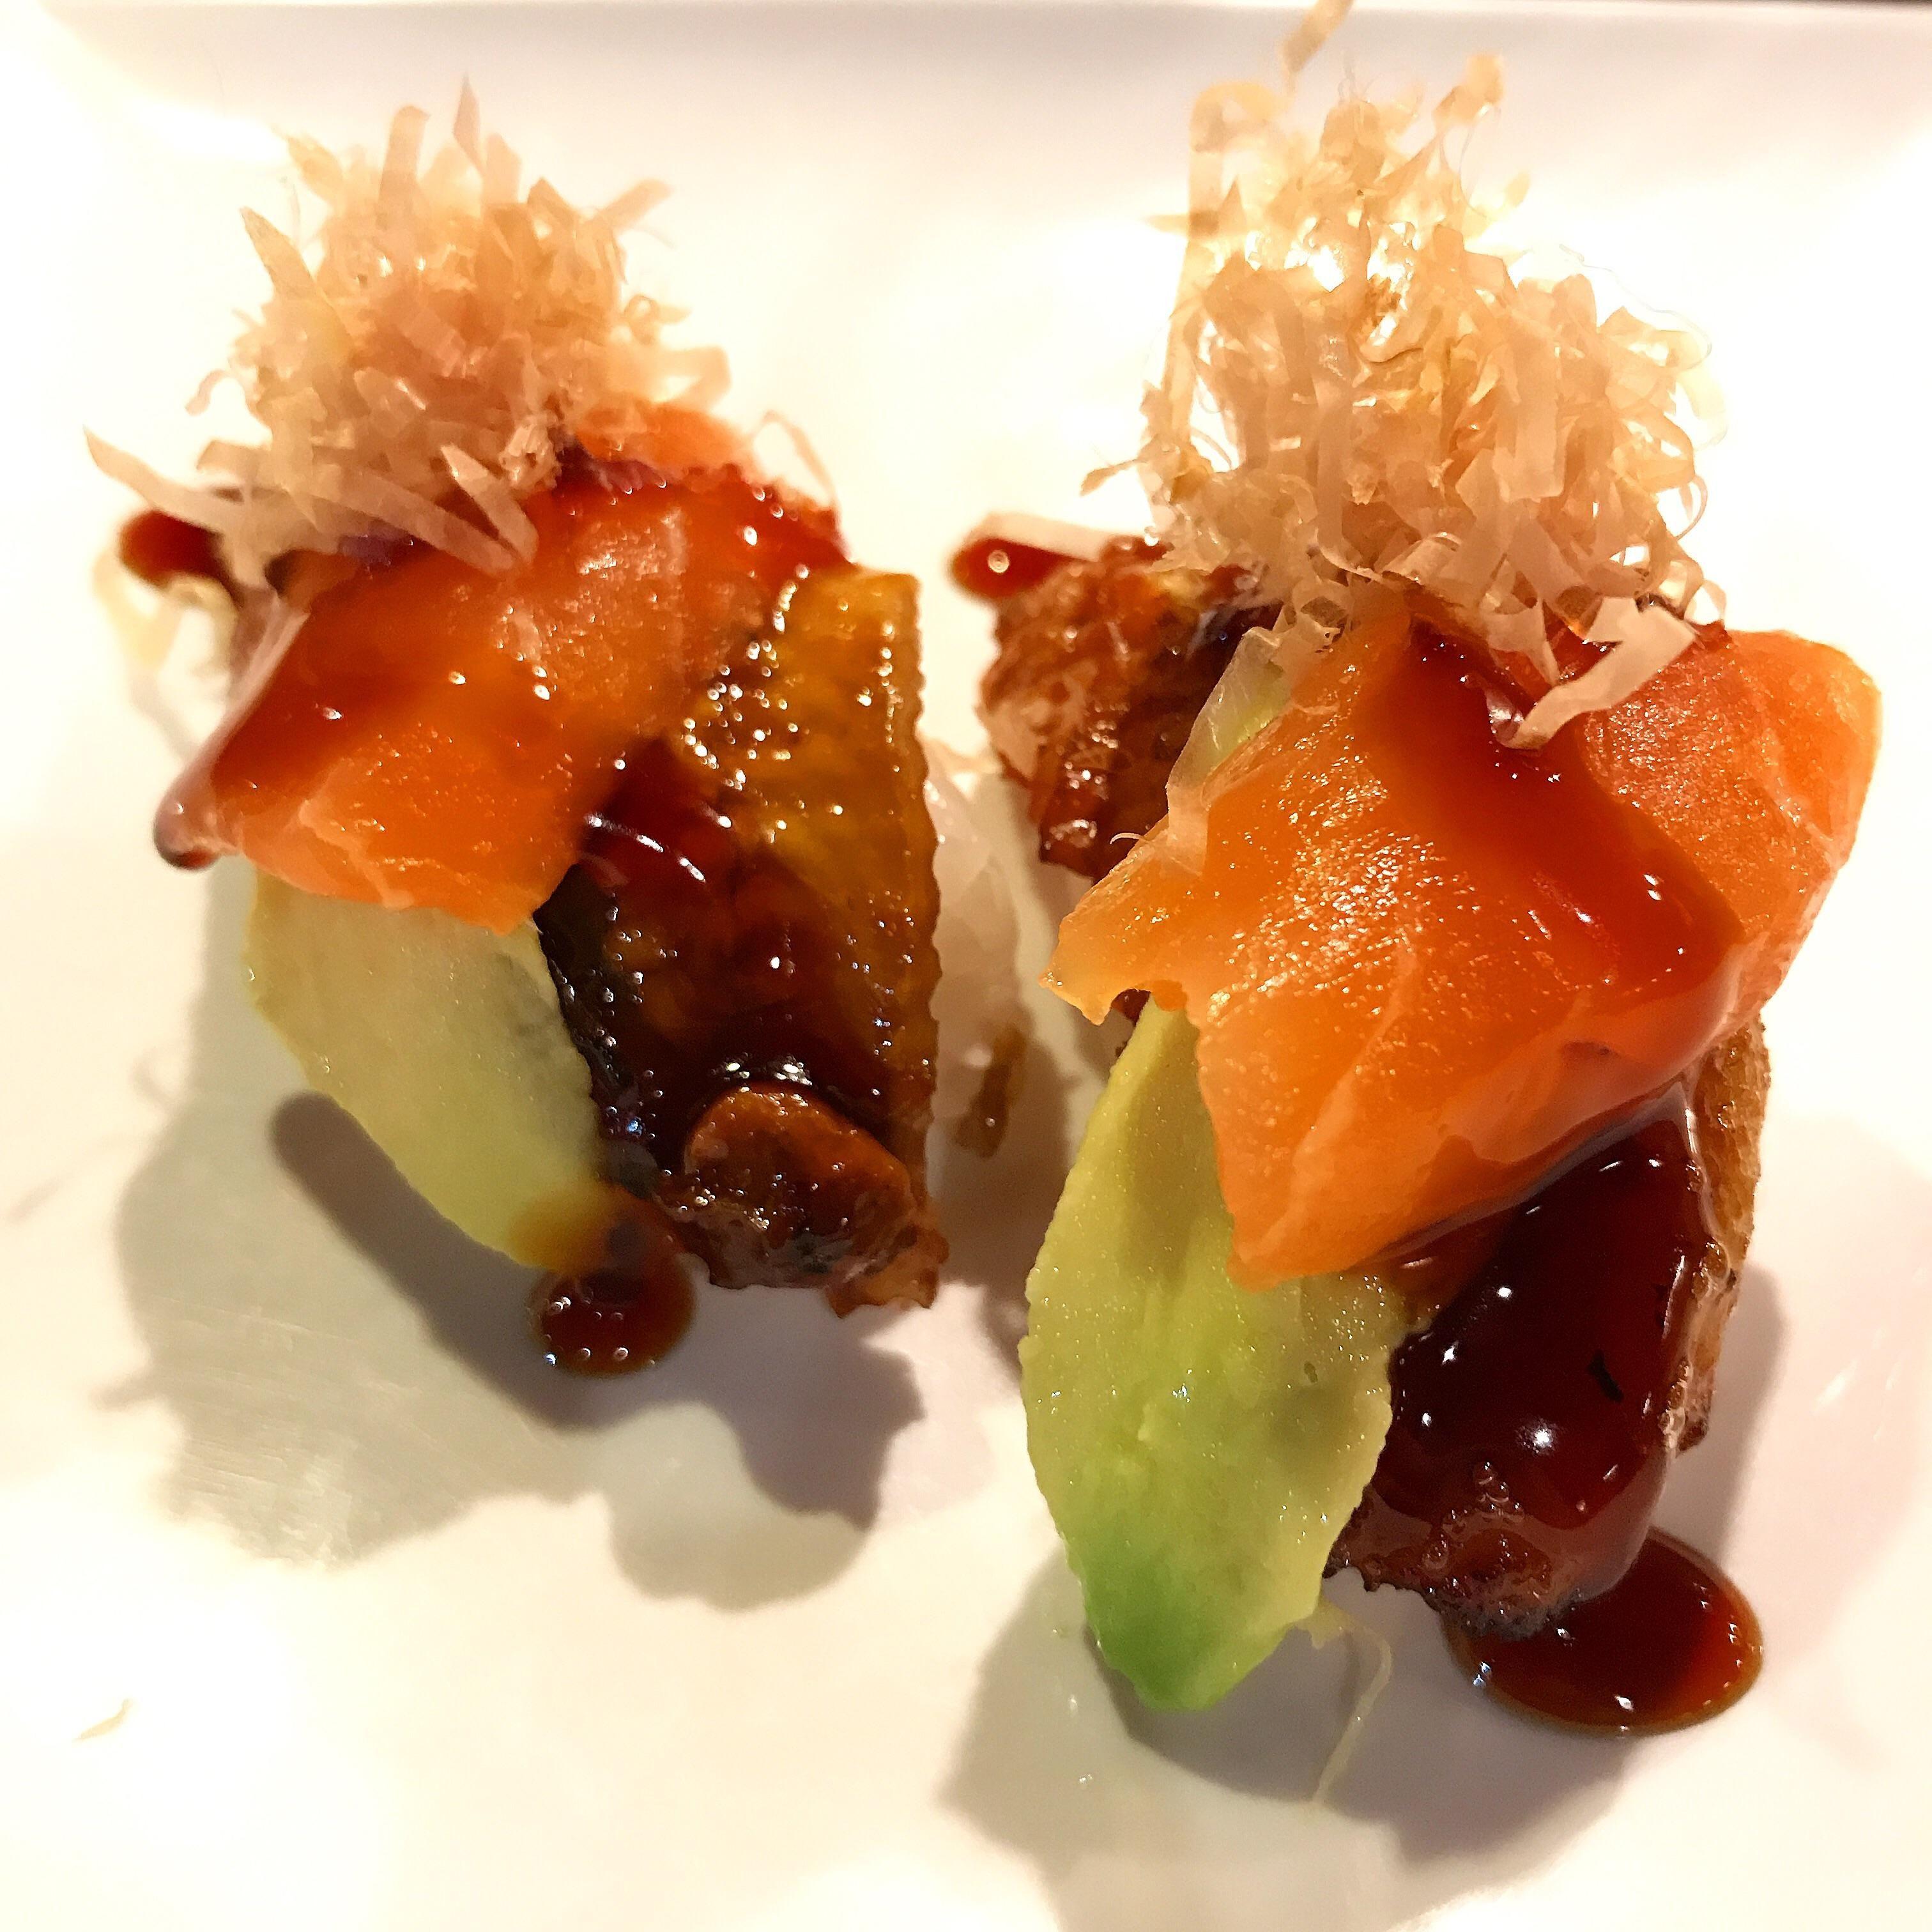 Pin on Sushi & Sashimi & Japanese Food